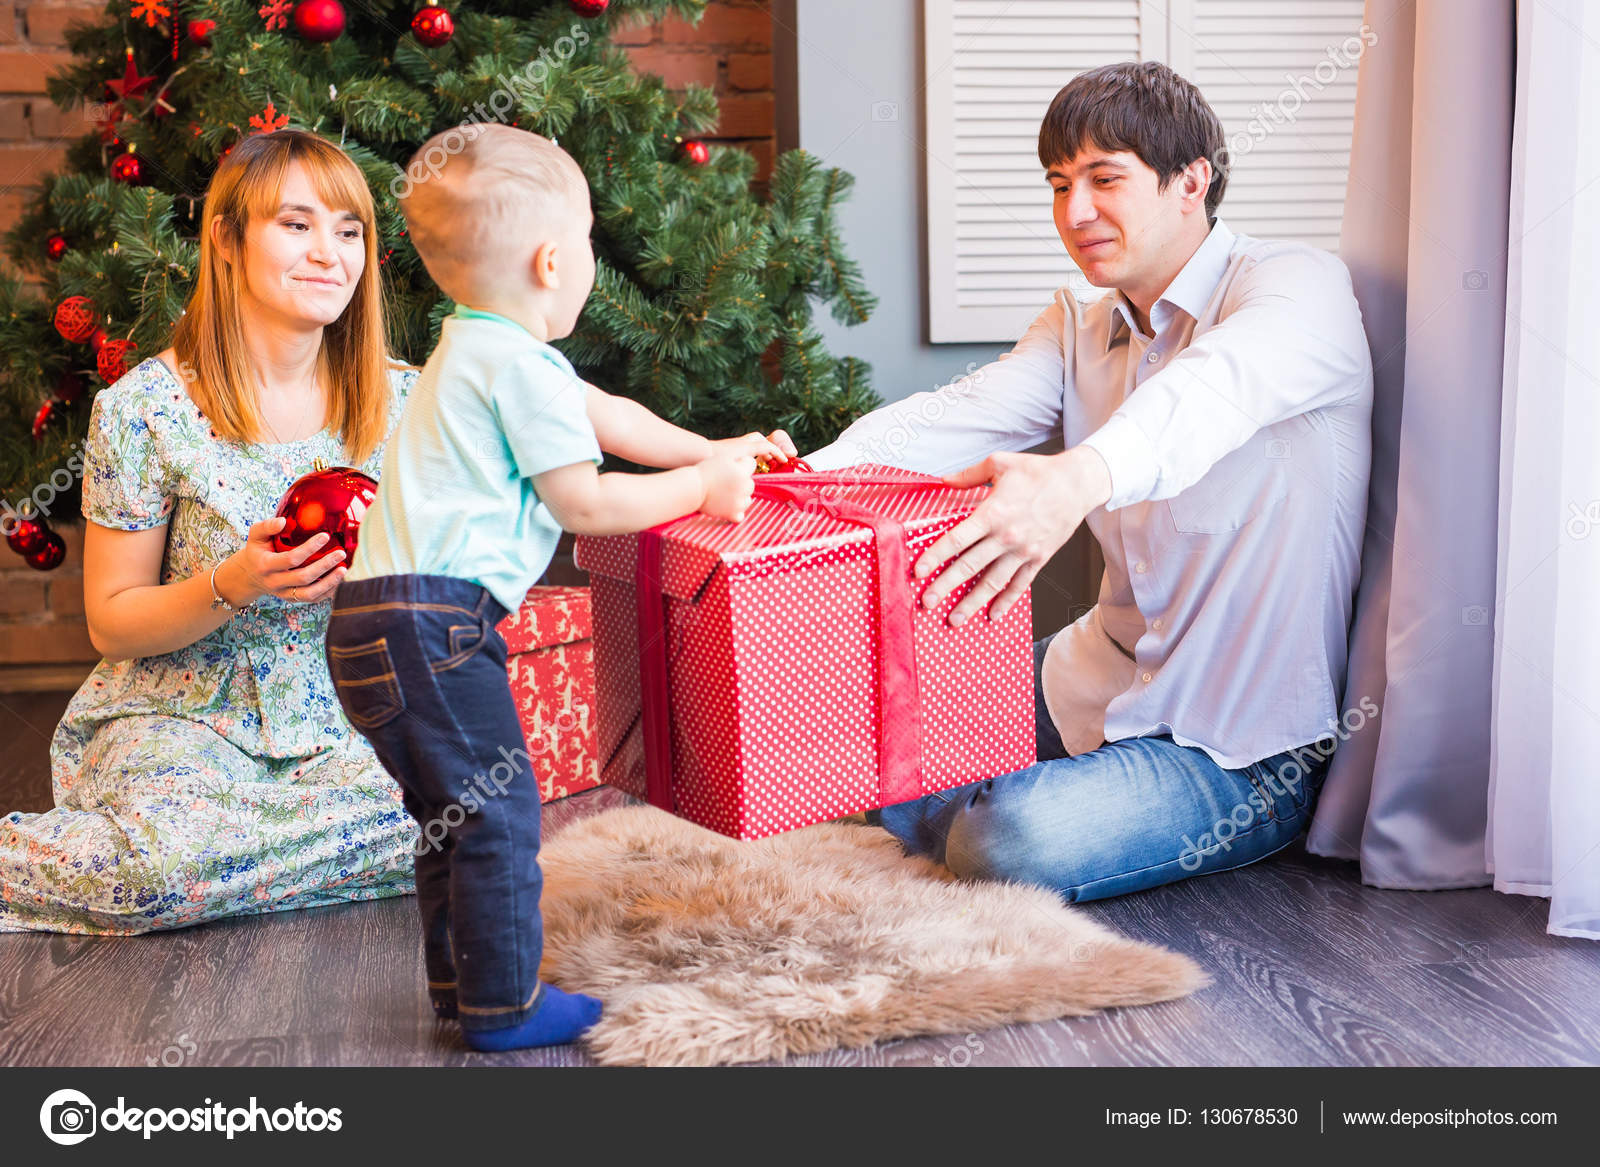 Kerst Familie Met Baby Gelukkig Kind Met Cadeau Kerstboom